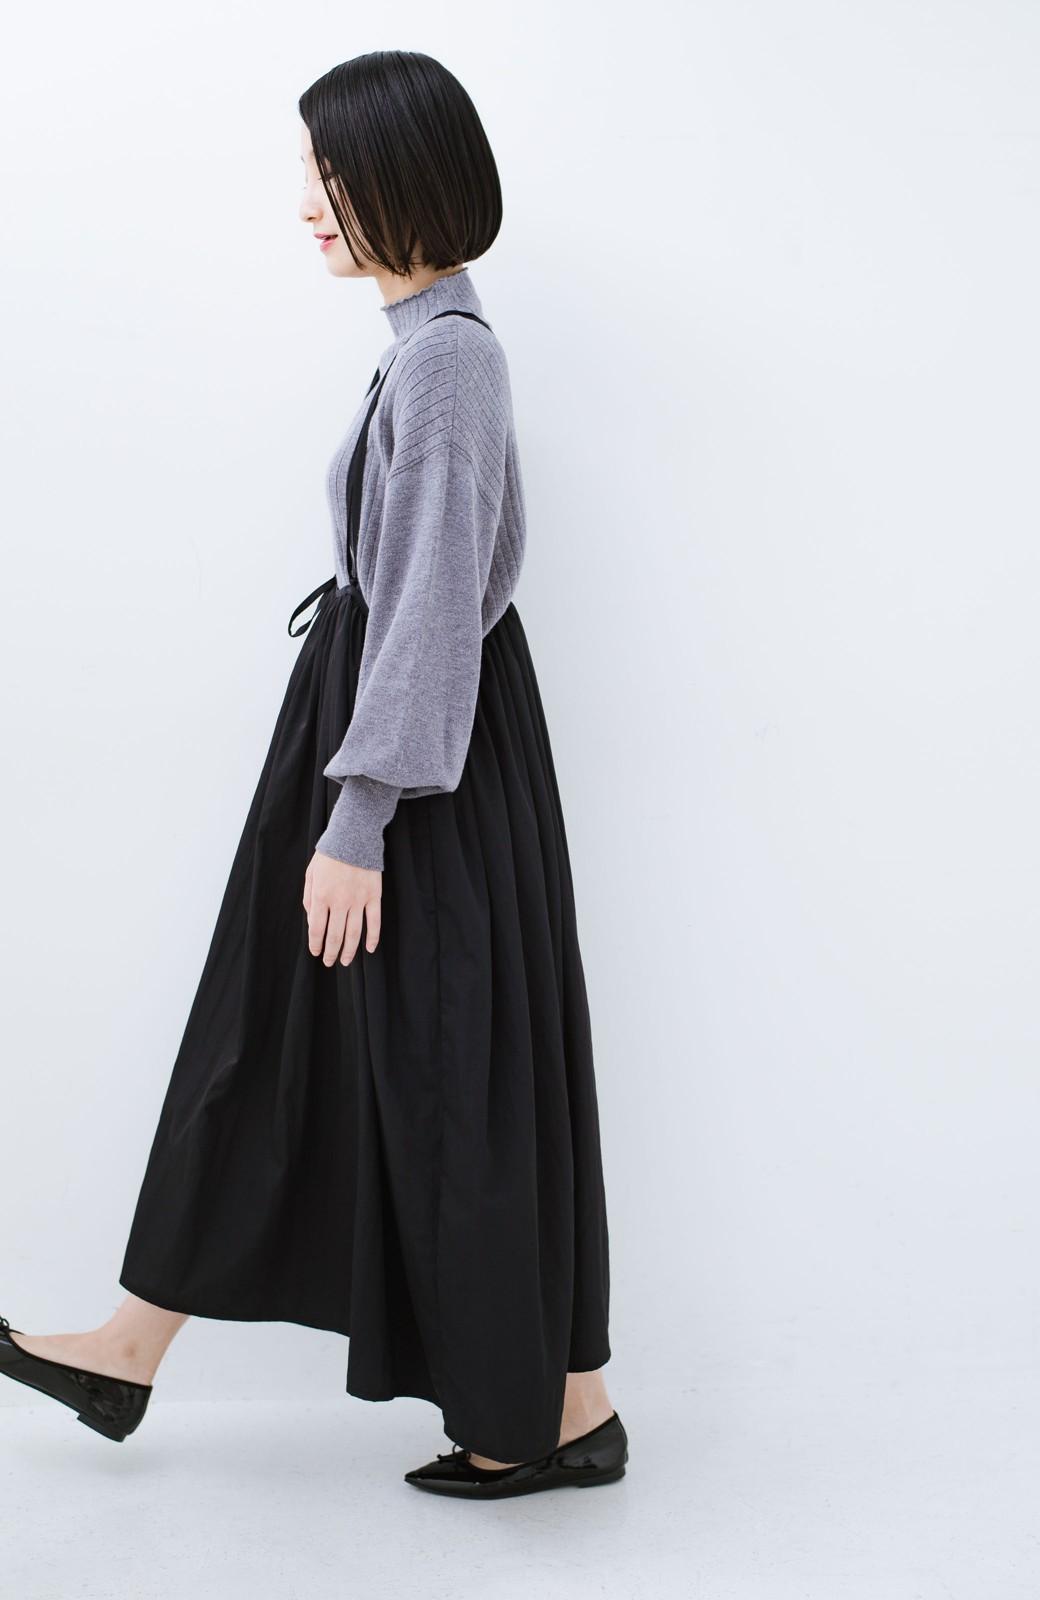 haco! 女の子バンザイ!プロジェクト【ブルー期】 ニットですら重ね着できる安心さ ゆったりギャザーキャミワンピ <ブラック>の商品写真18